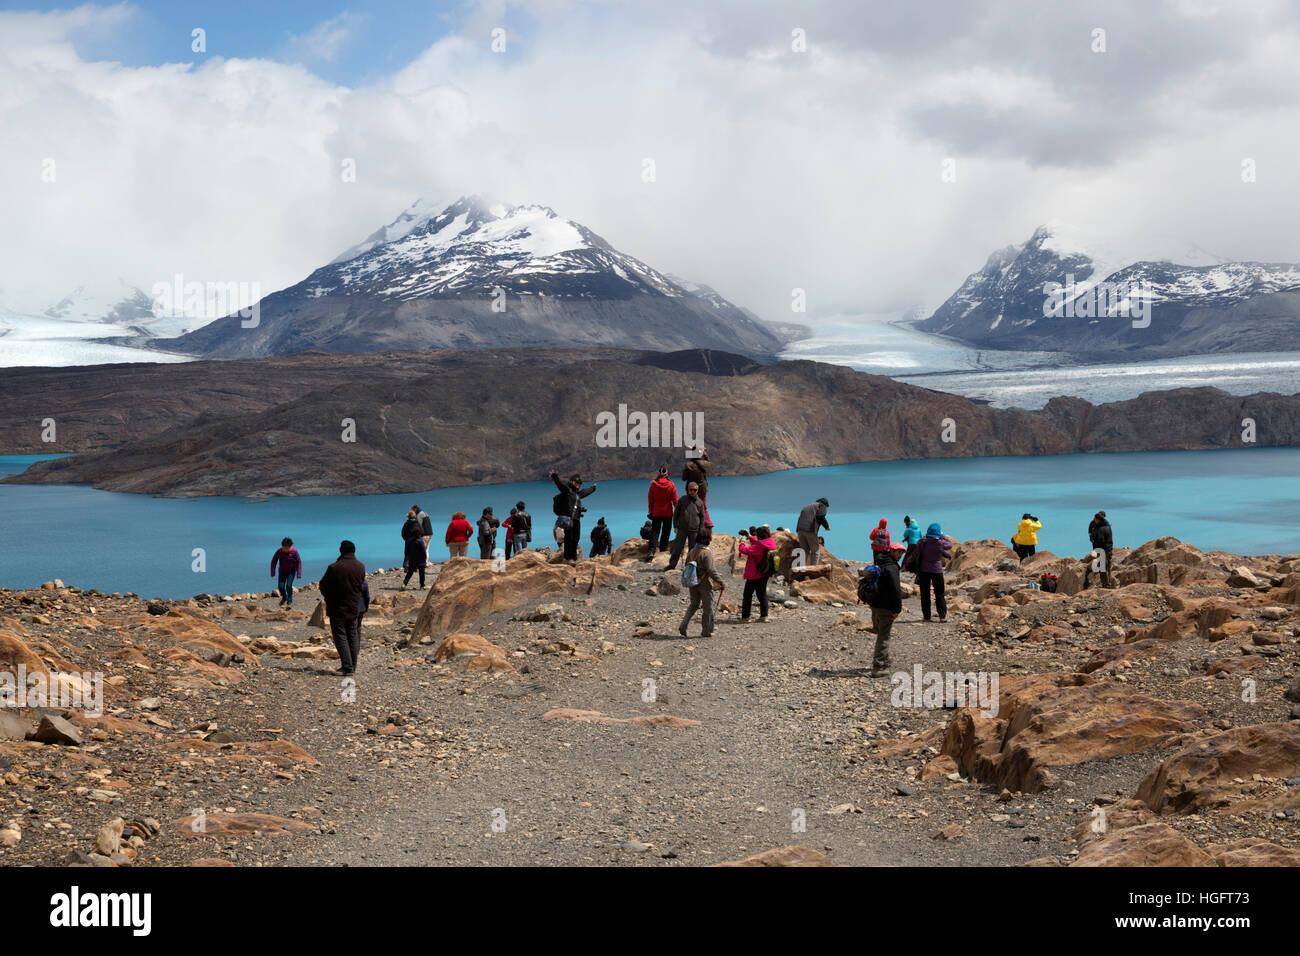 Affichage des touristes sur glacier Upsala Lago Argentino, El Calafate, parc national Los Glaciares, Patagonie, Photo Stock